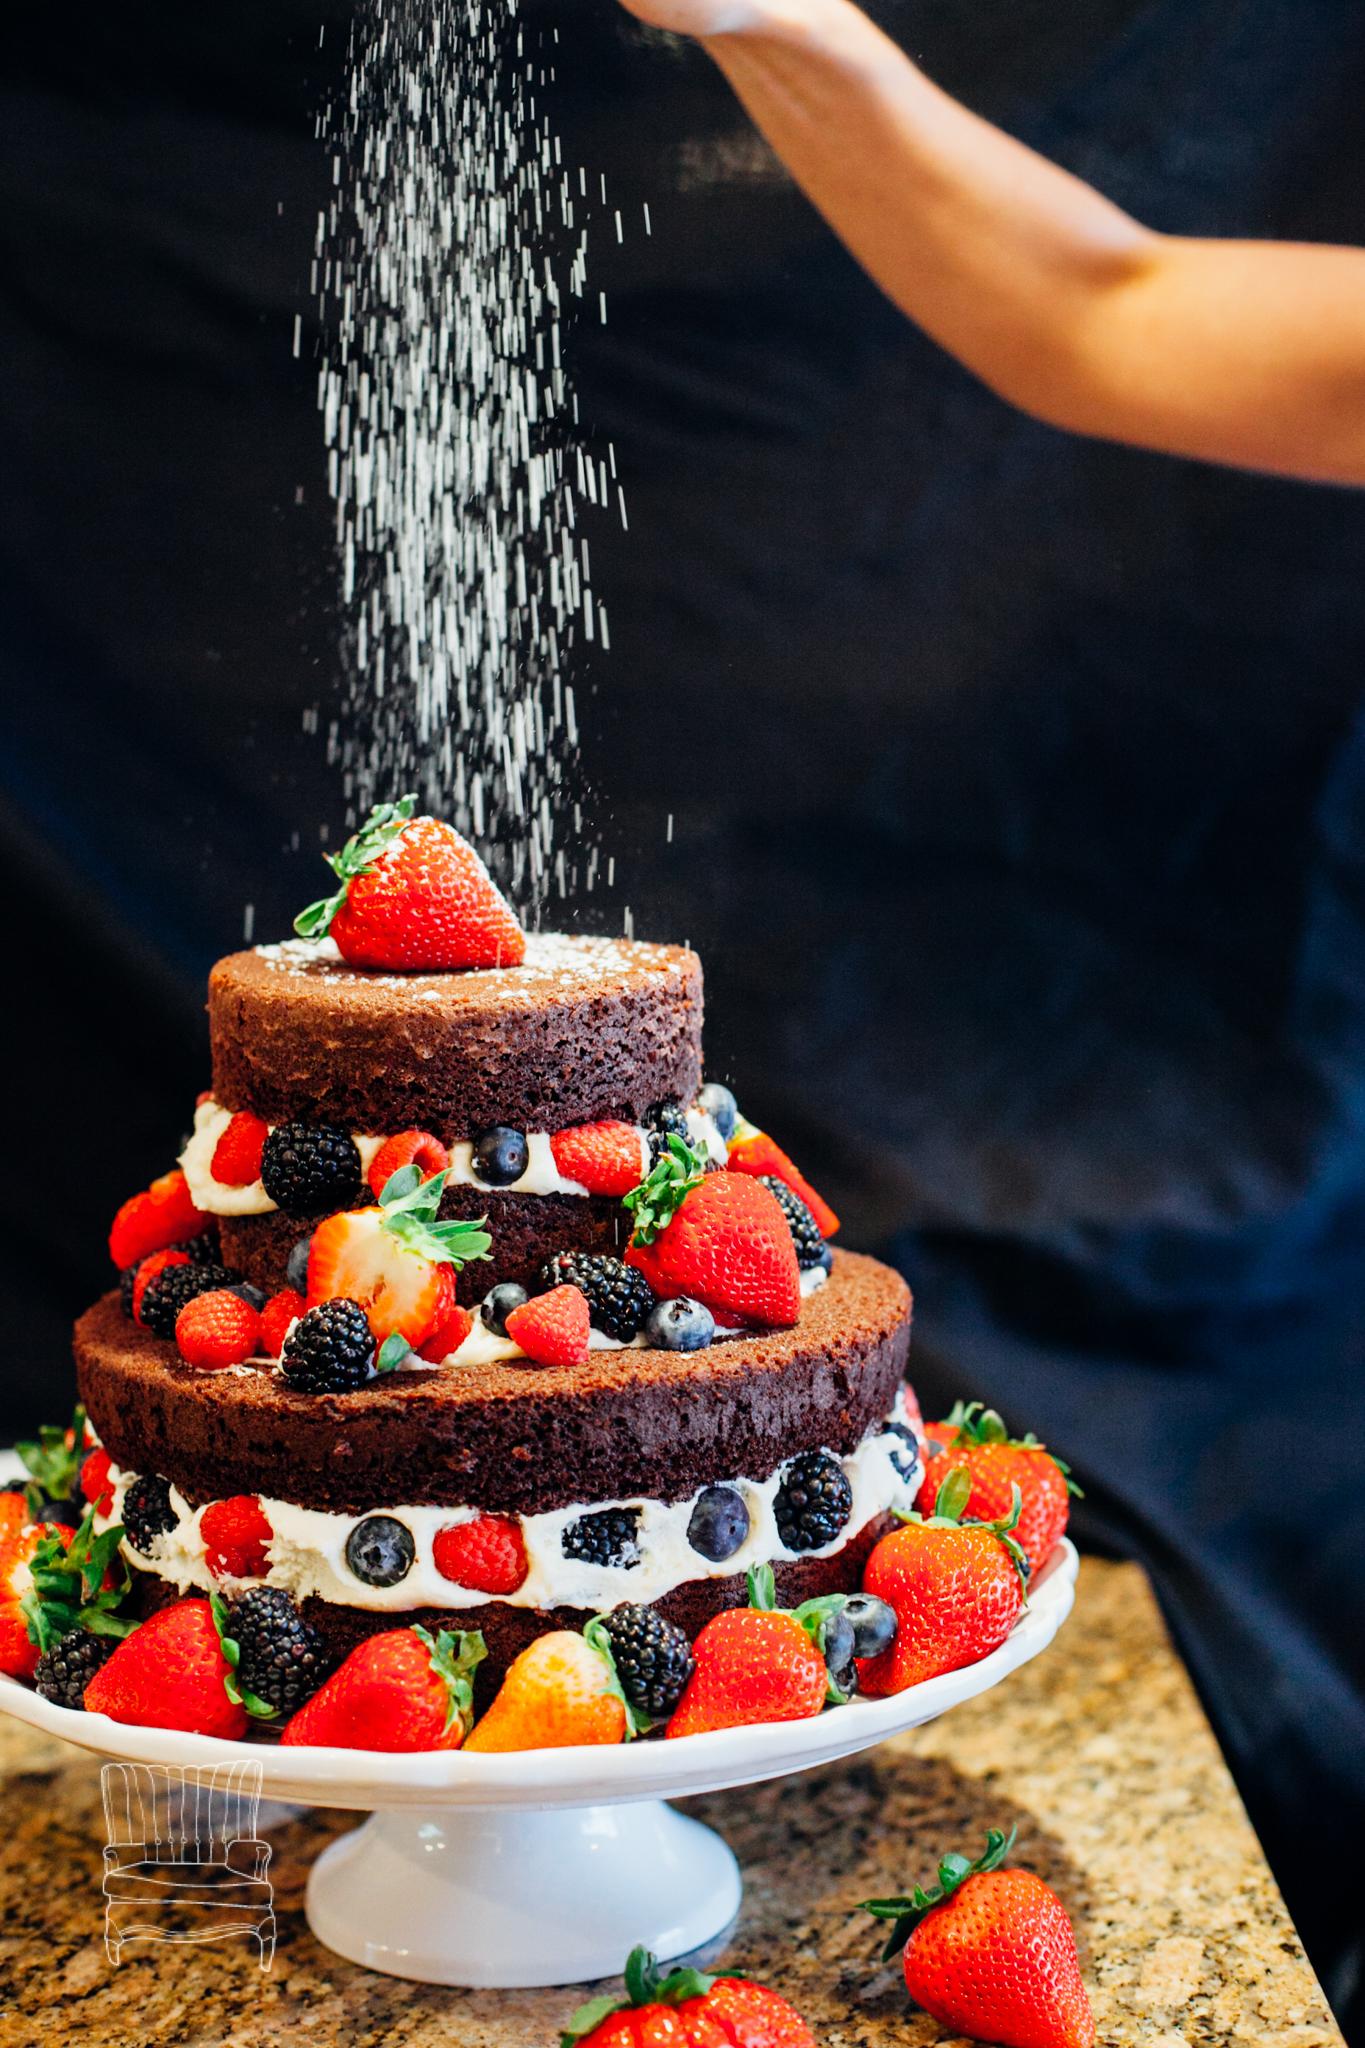 bellingham-seattle-marketing-food-photographer-dessert-slice-of-heaven-2-2.jpg